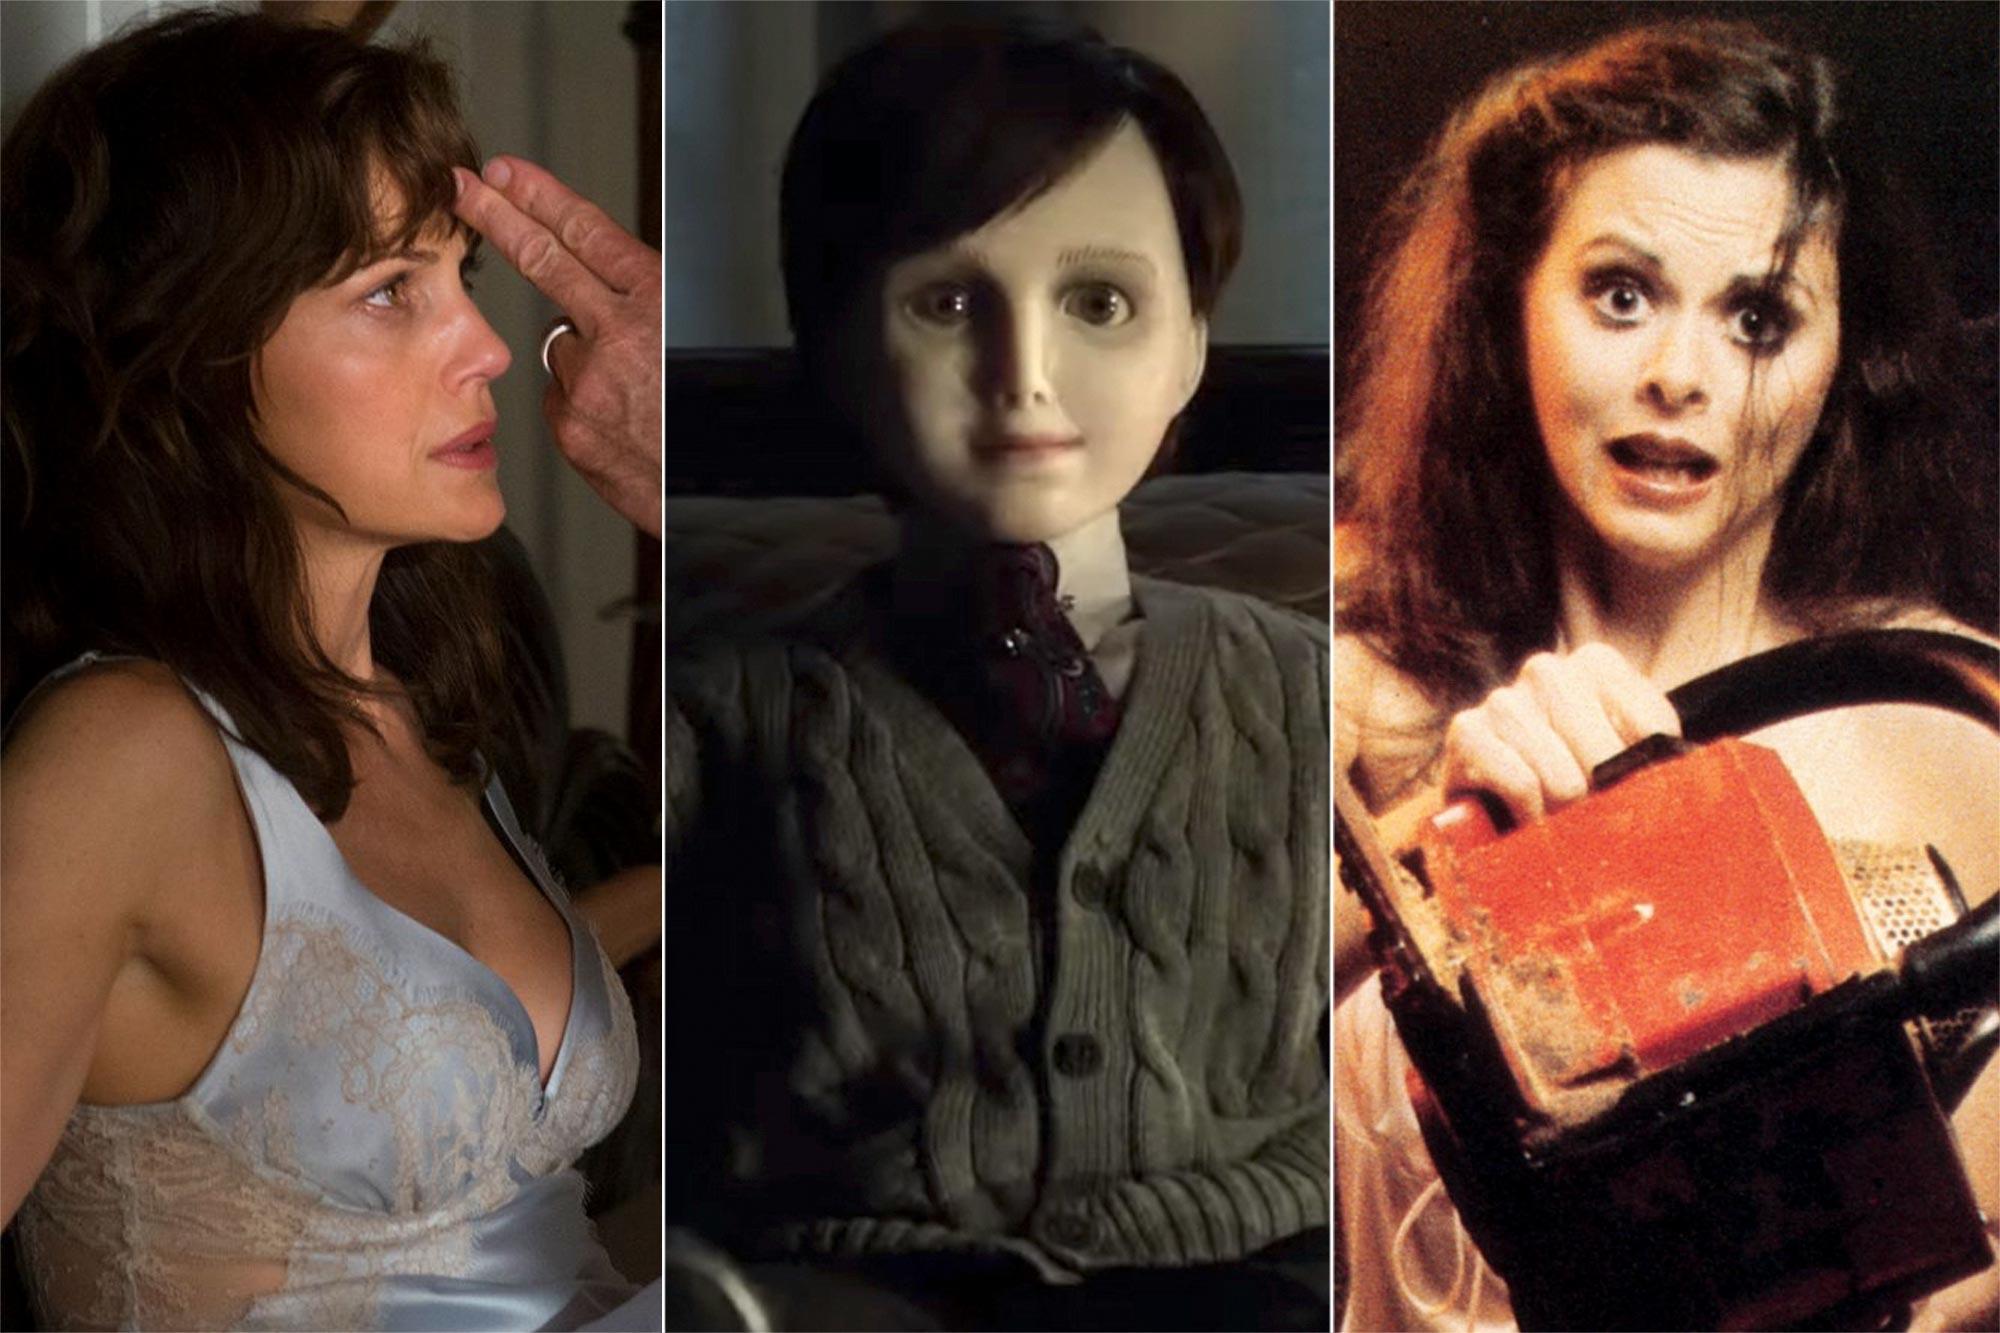 Scariest movies on Netflix